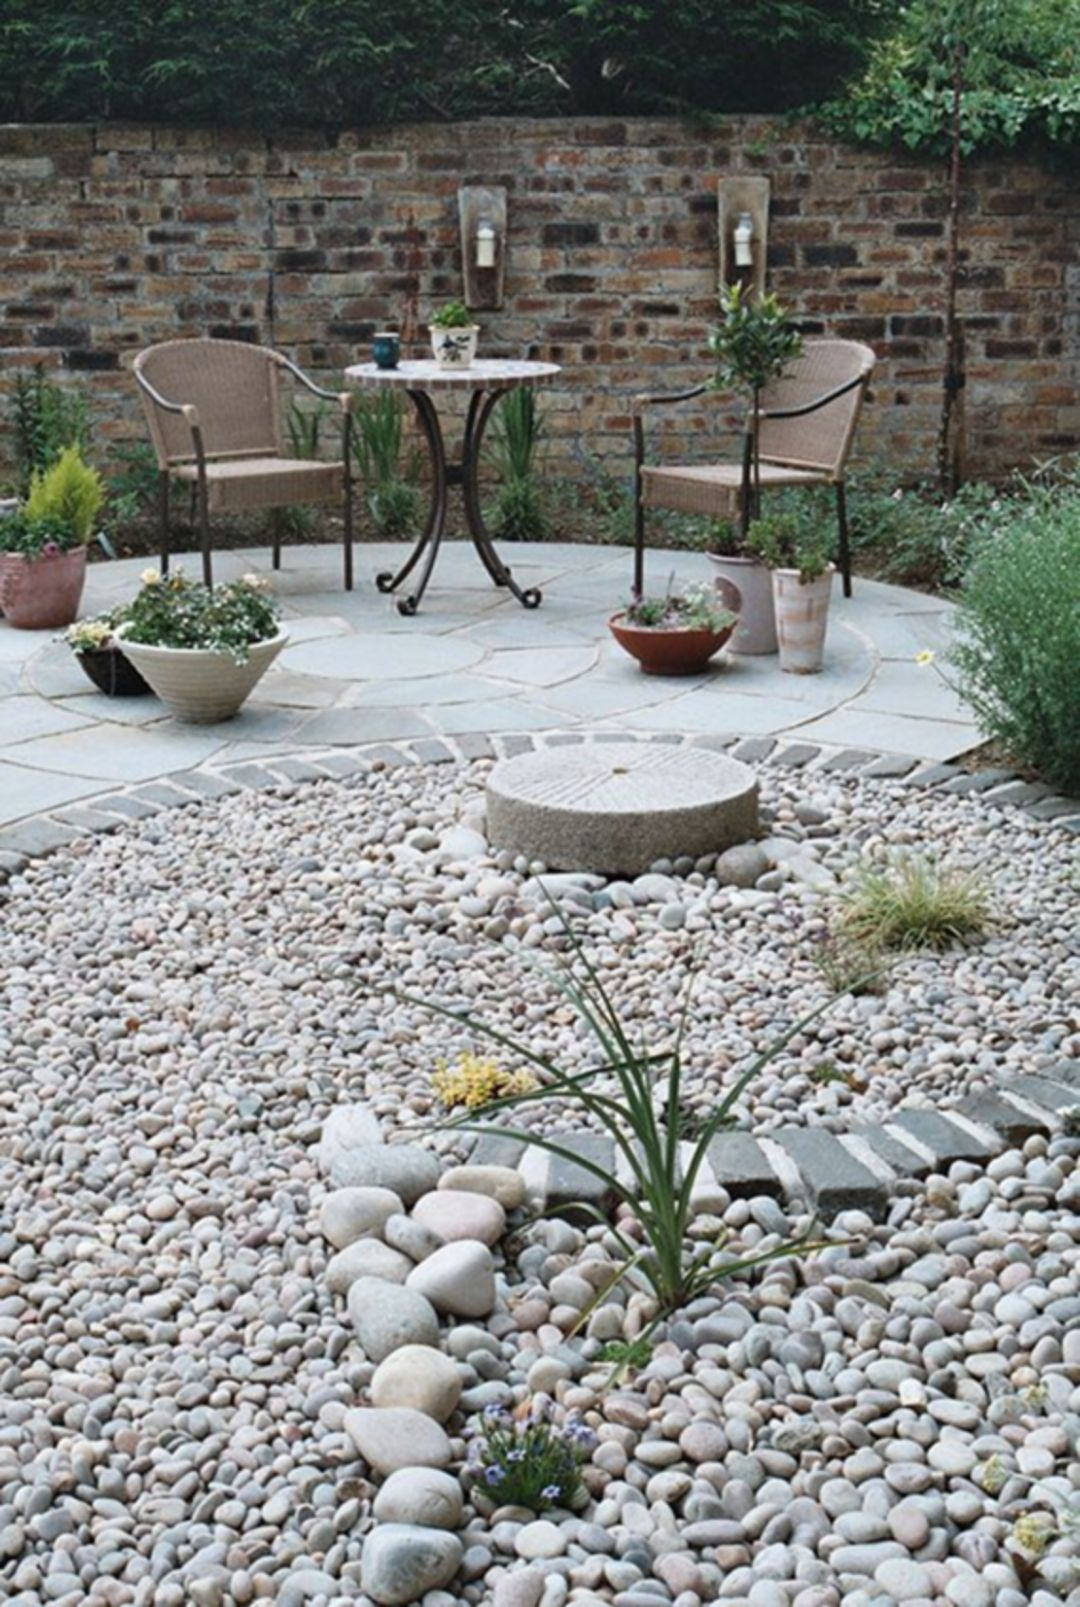 20 Gorgeous Zen Garden Design Ideas For Inspiration Backyard Garden Landscape Small Courtyard Gardens Backyard Landscaping